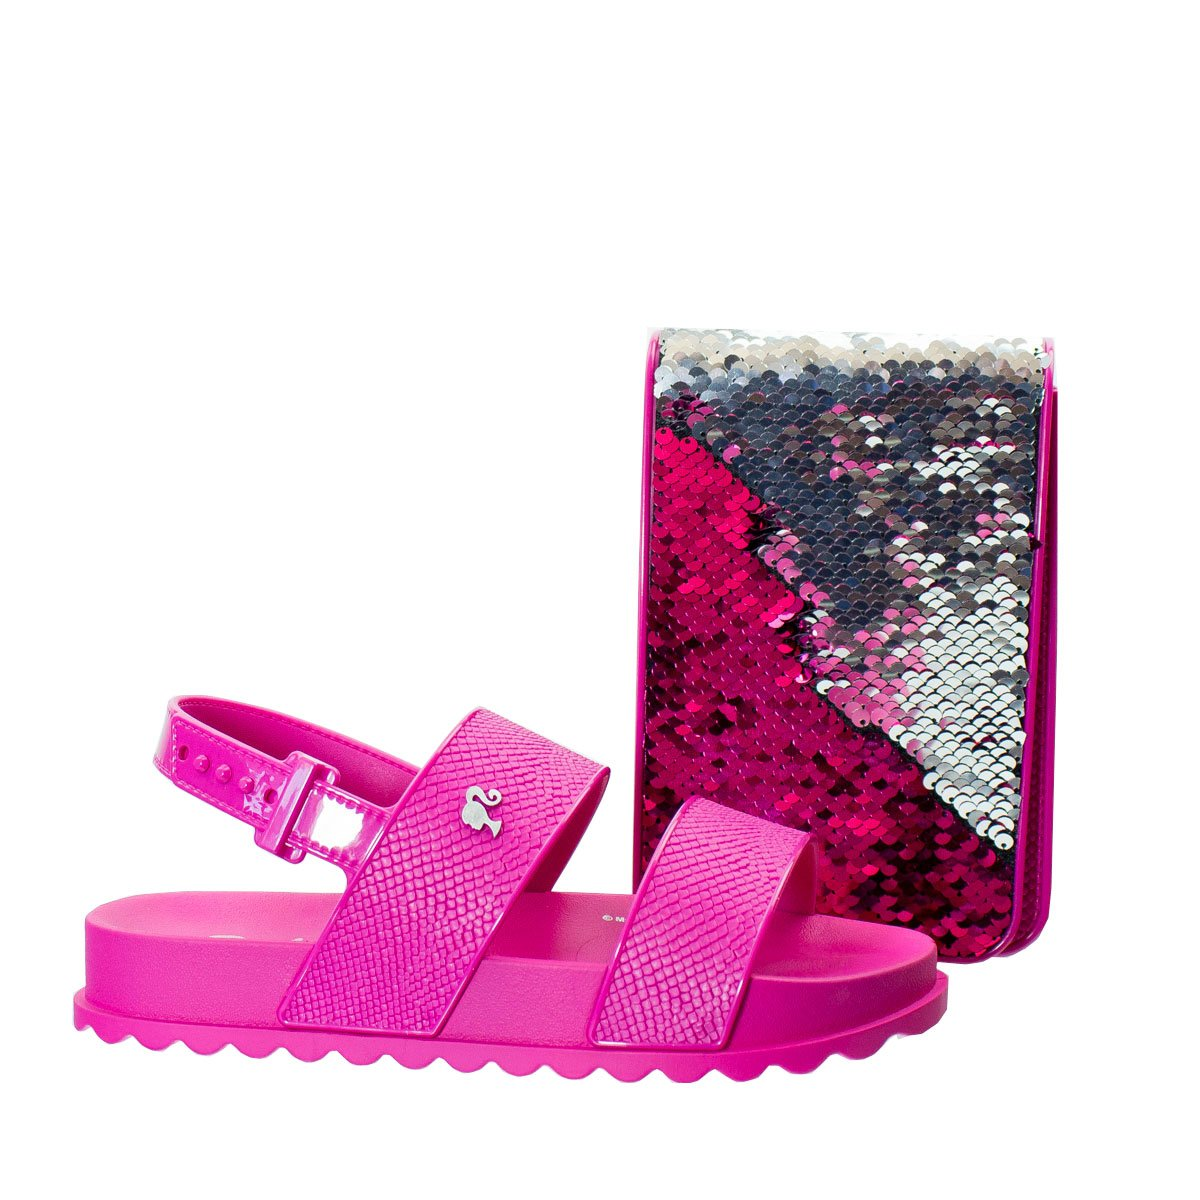 c02479ca66 Bizz Store - Sandália Infantil Grendene Barbie Duo Shine Bolsa